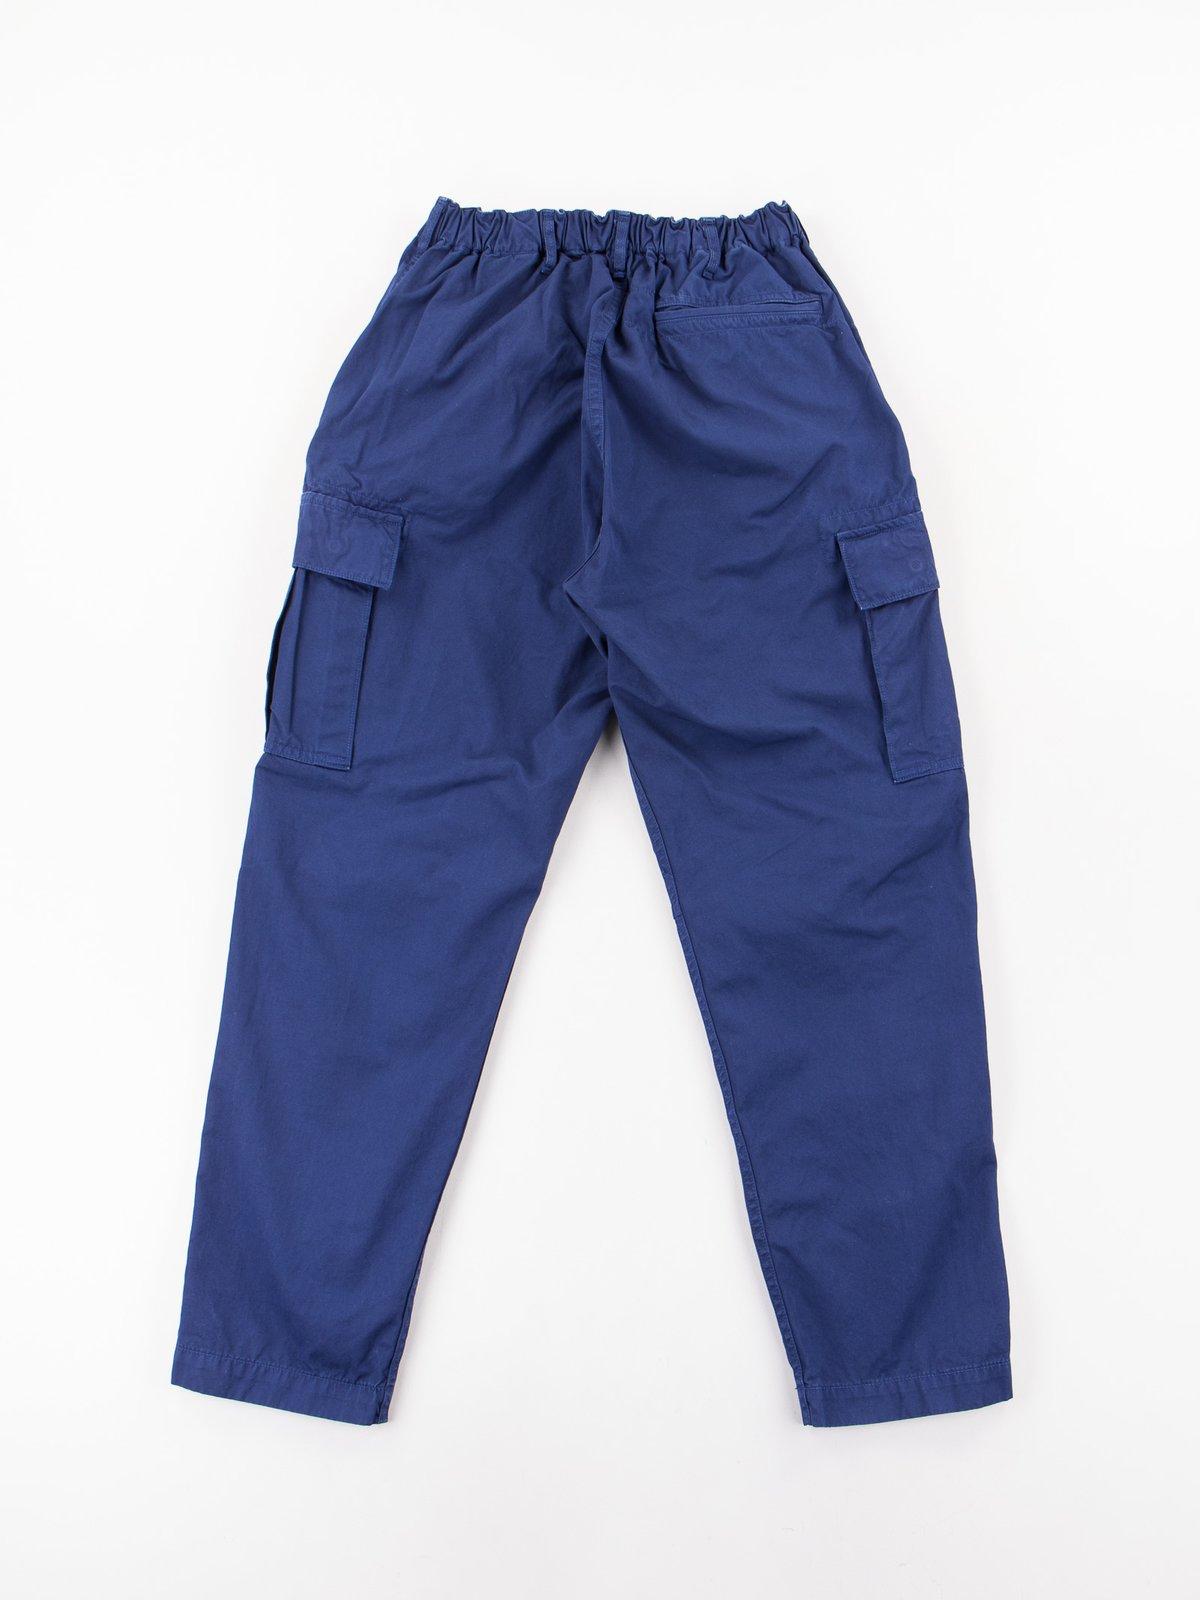 Ink Blue Poplin Easy Cargo Pant - Image 9